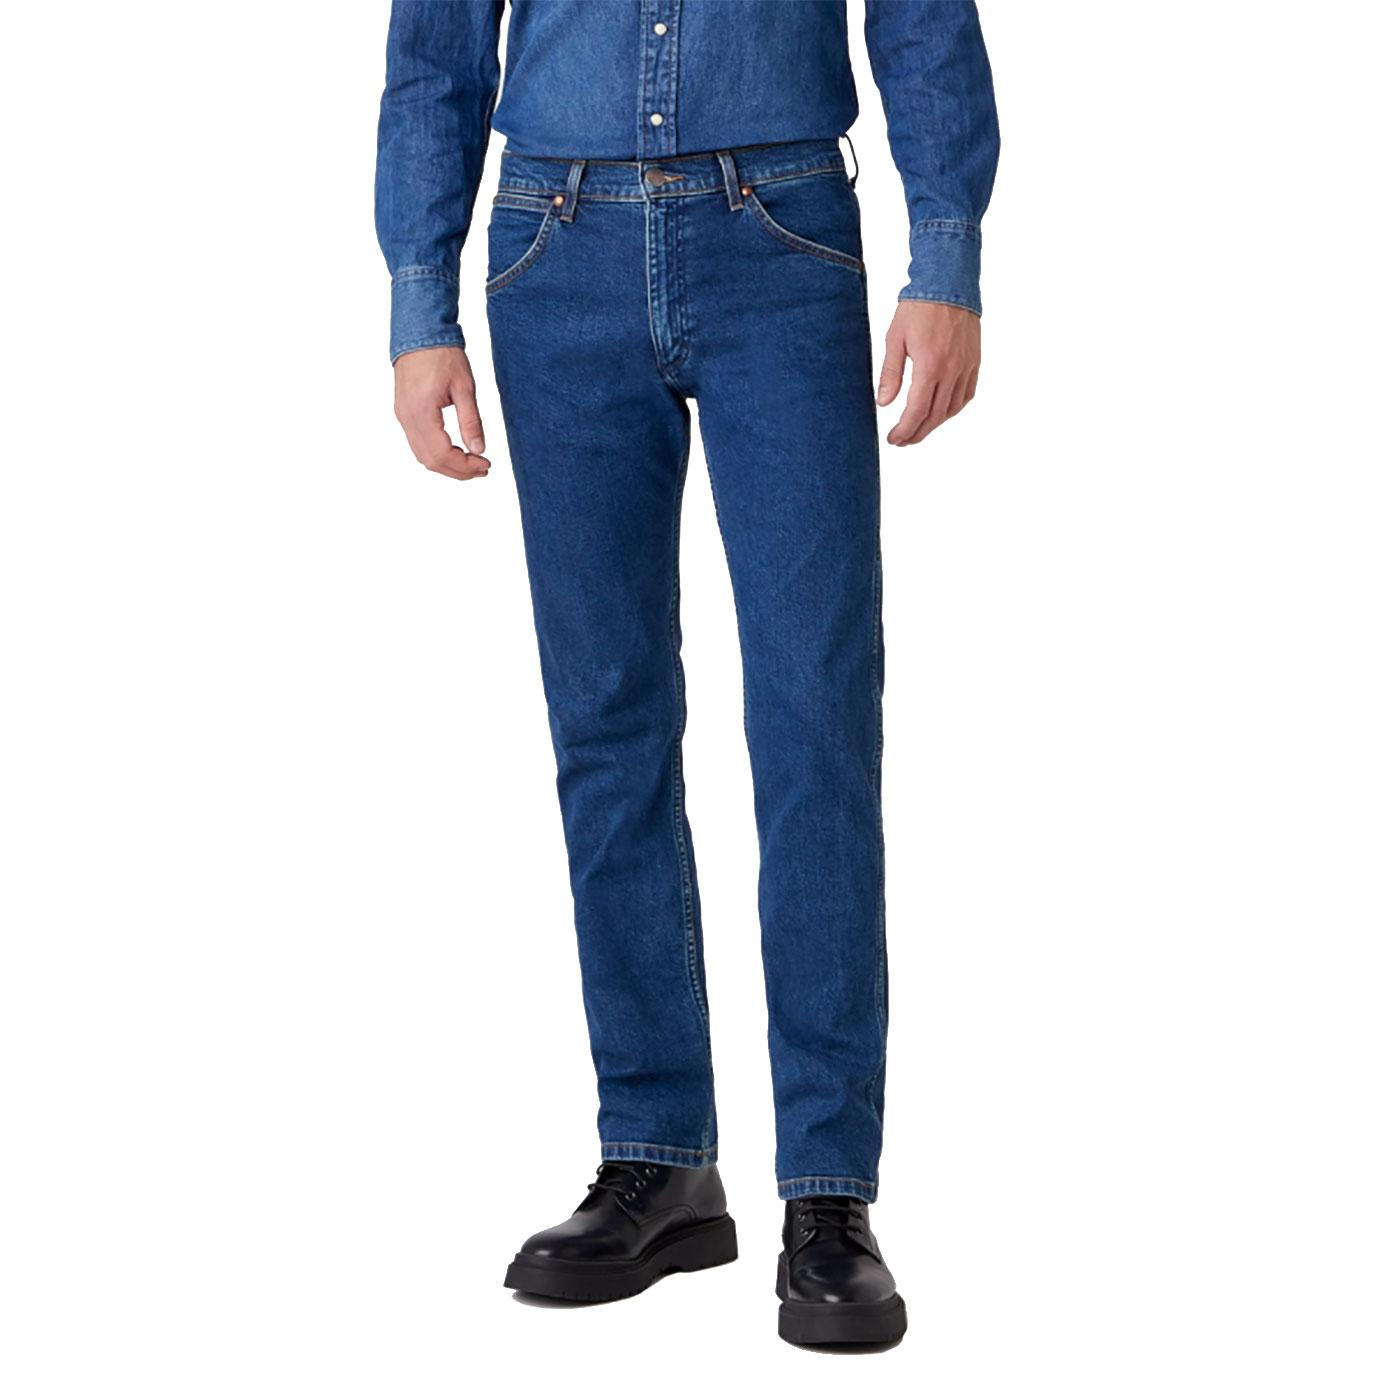 11MWZ WRANGLER Slim Western Jeans - 6 Month Wash